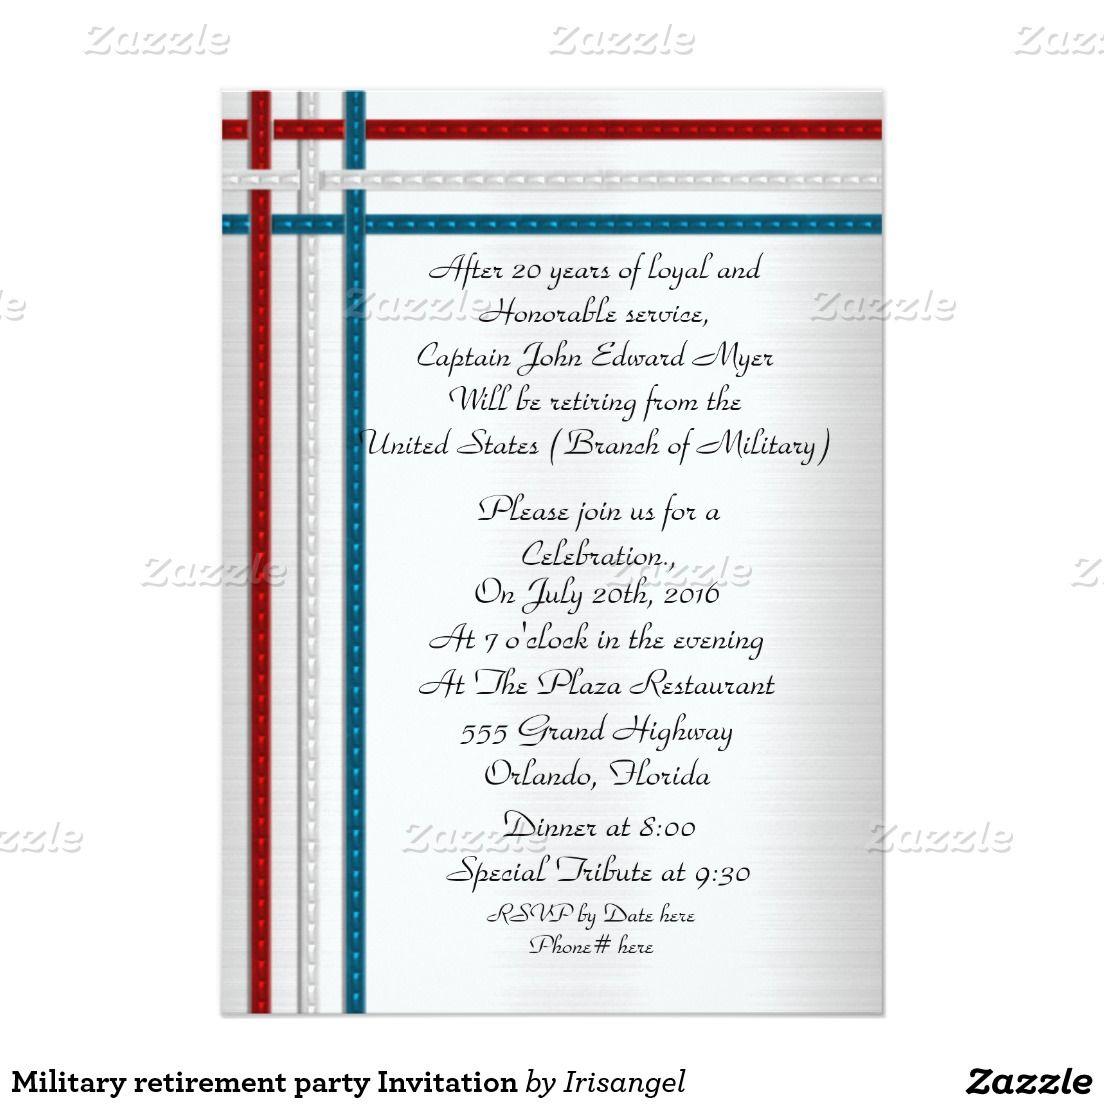 Patriotic Military Retirement Party Invitation Military Retirement